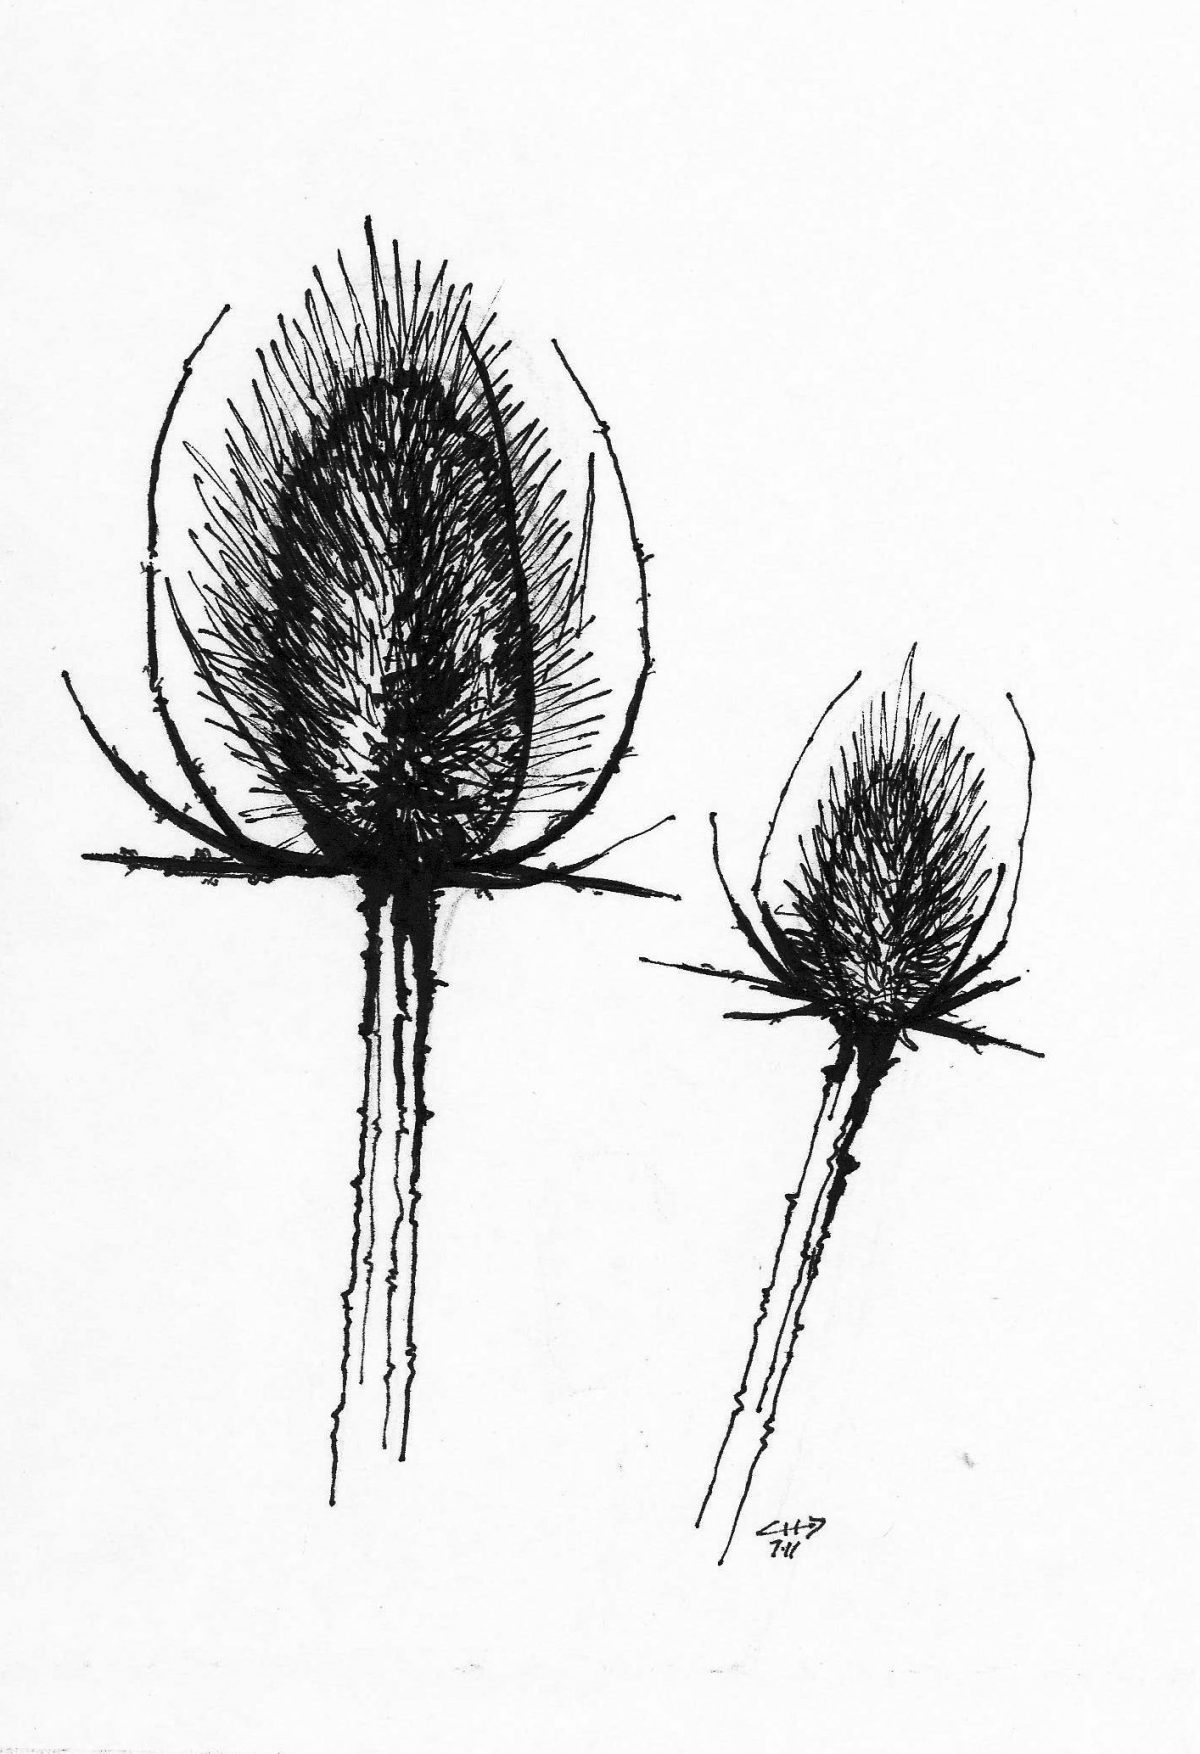 Flower - Pen on paper, paper, illustration, ch3